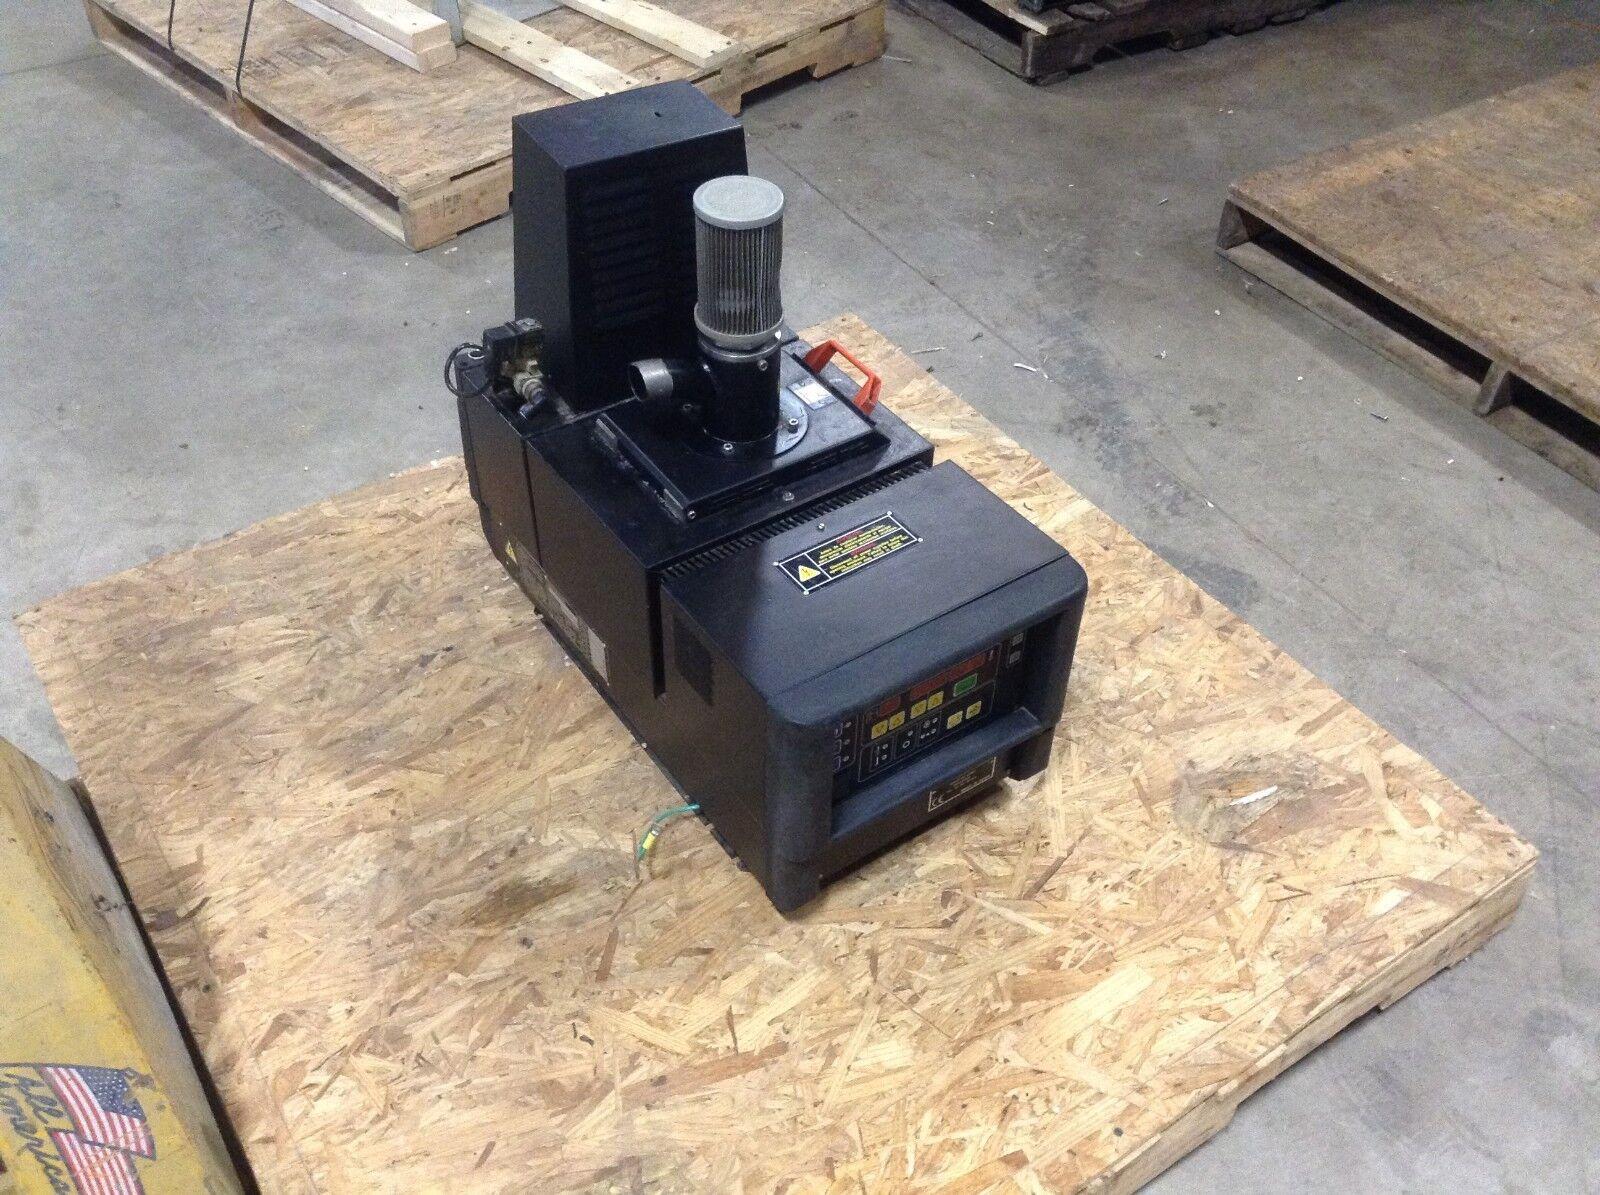 Melton 8KG Hot Glue Adhesive Unit 2900 W 230-400 V Control 33 Easy Pac